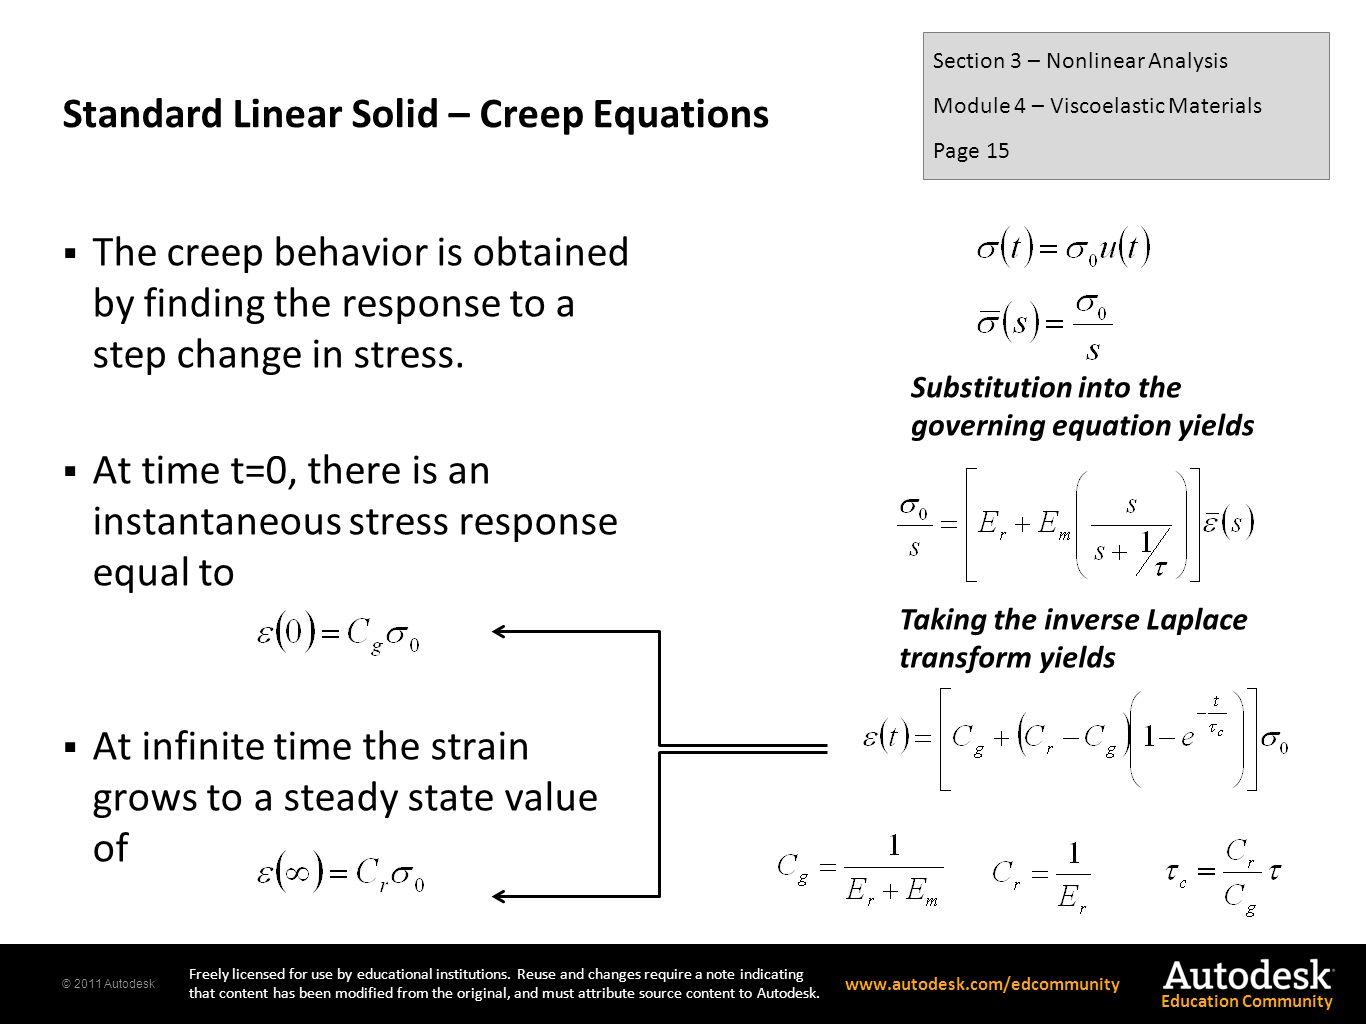 Standard Linear Solid – Creep Equations